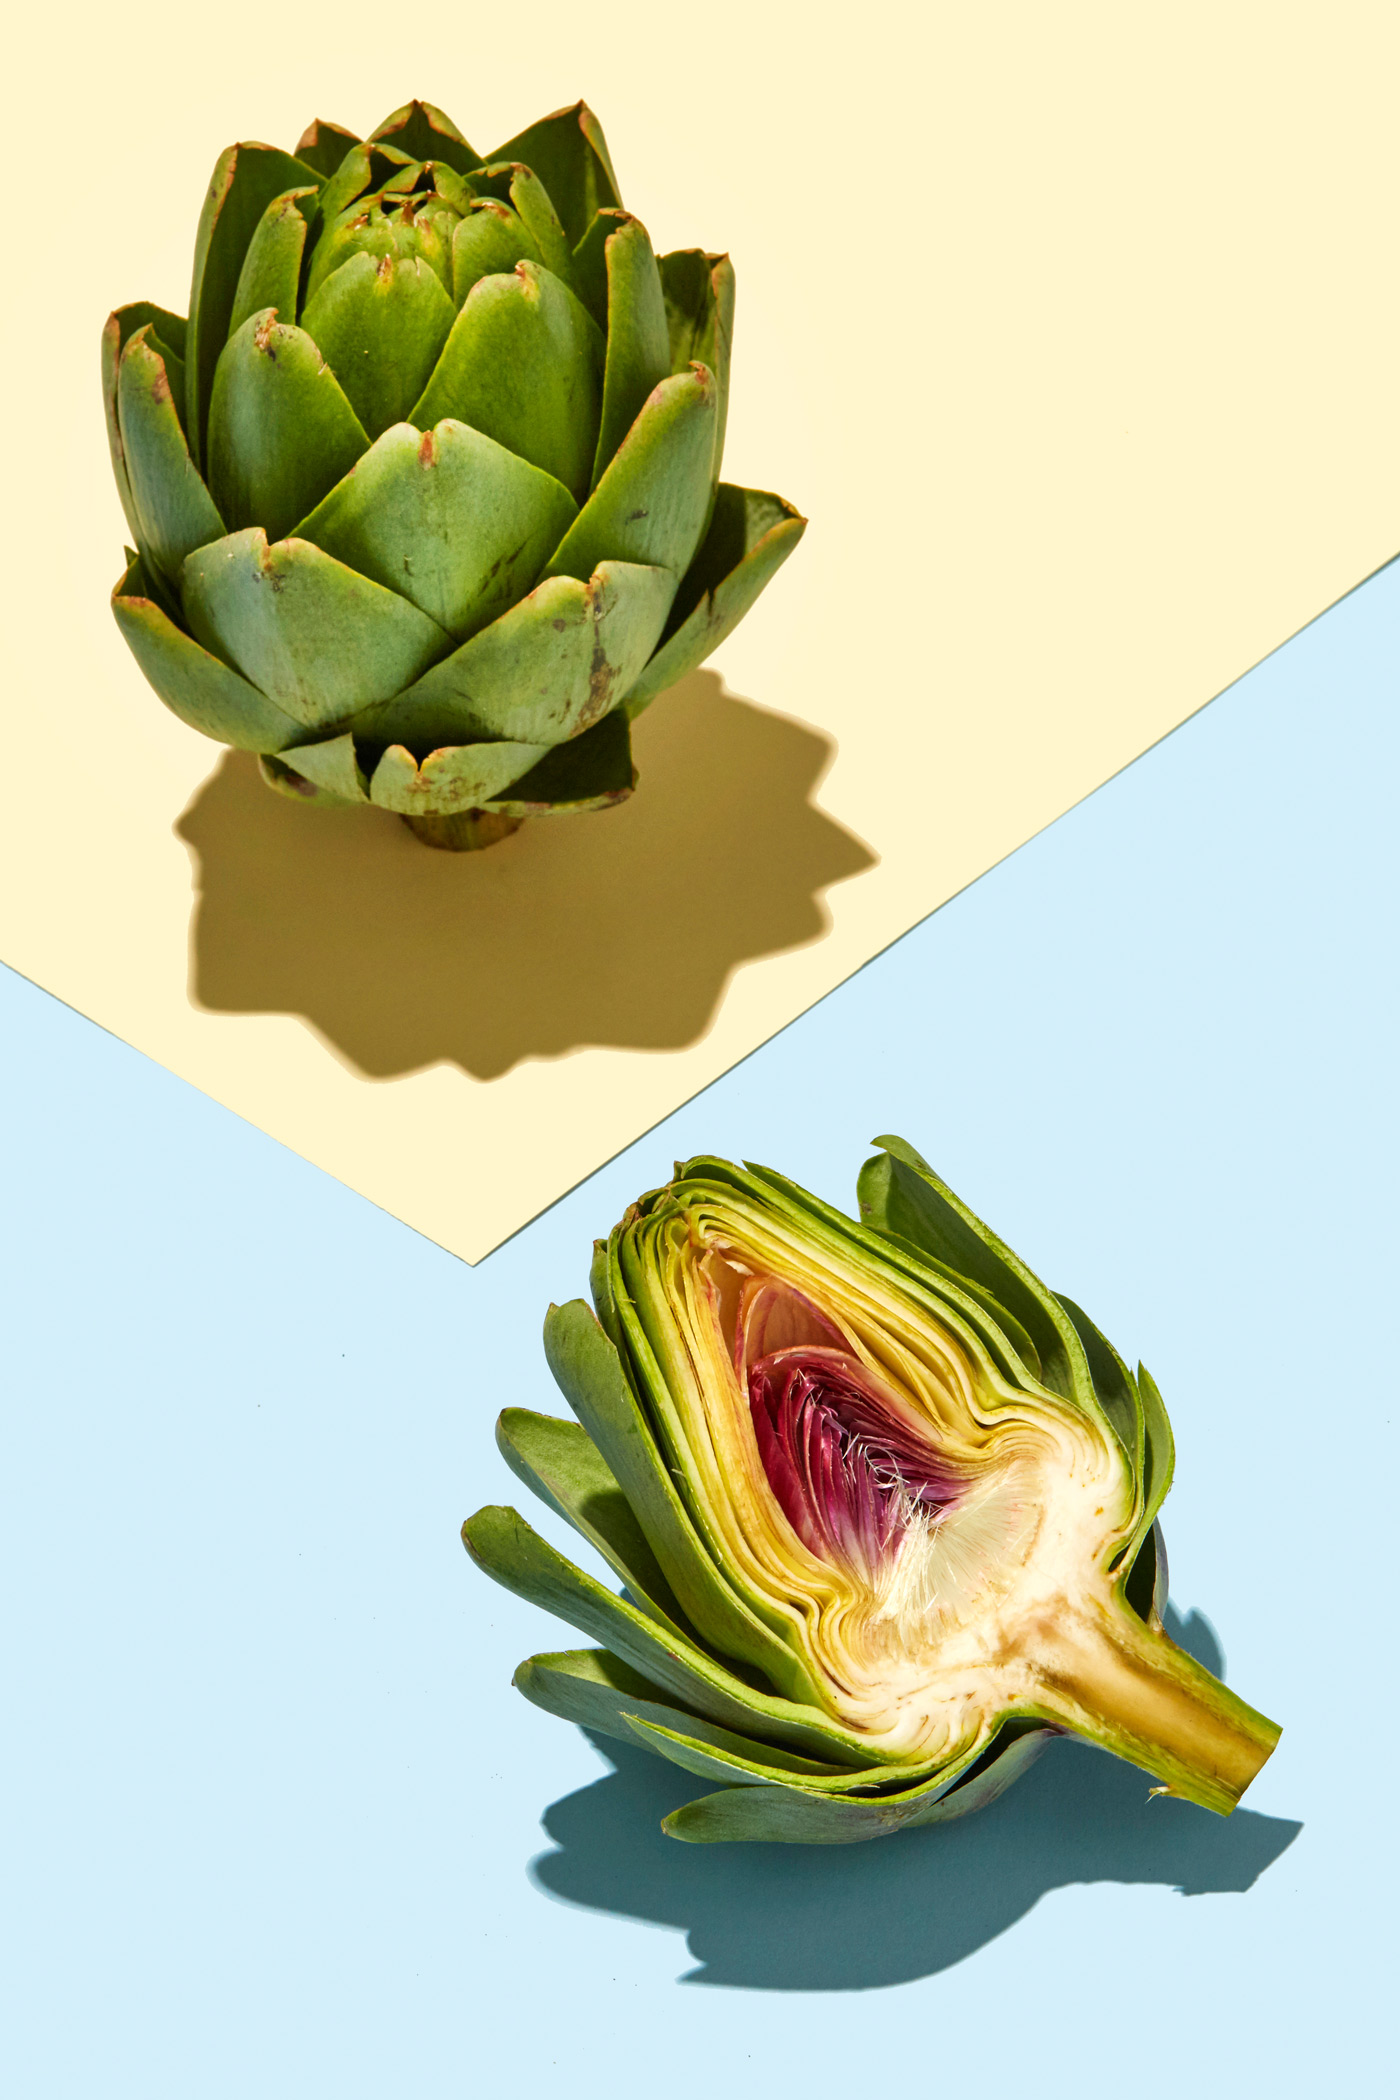 healthiest foods, health food, diet, nutrition, time.com stock, artichokes